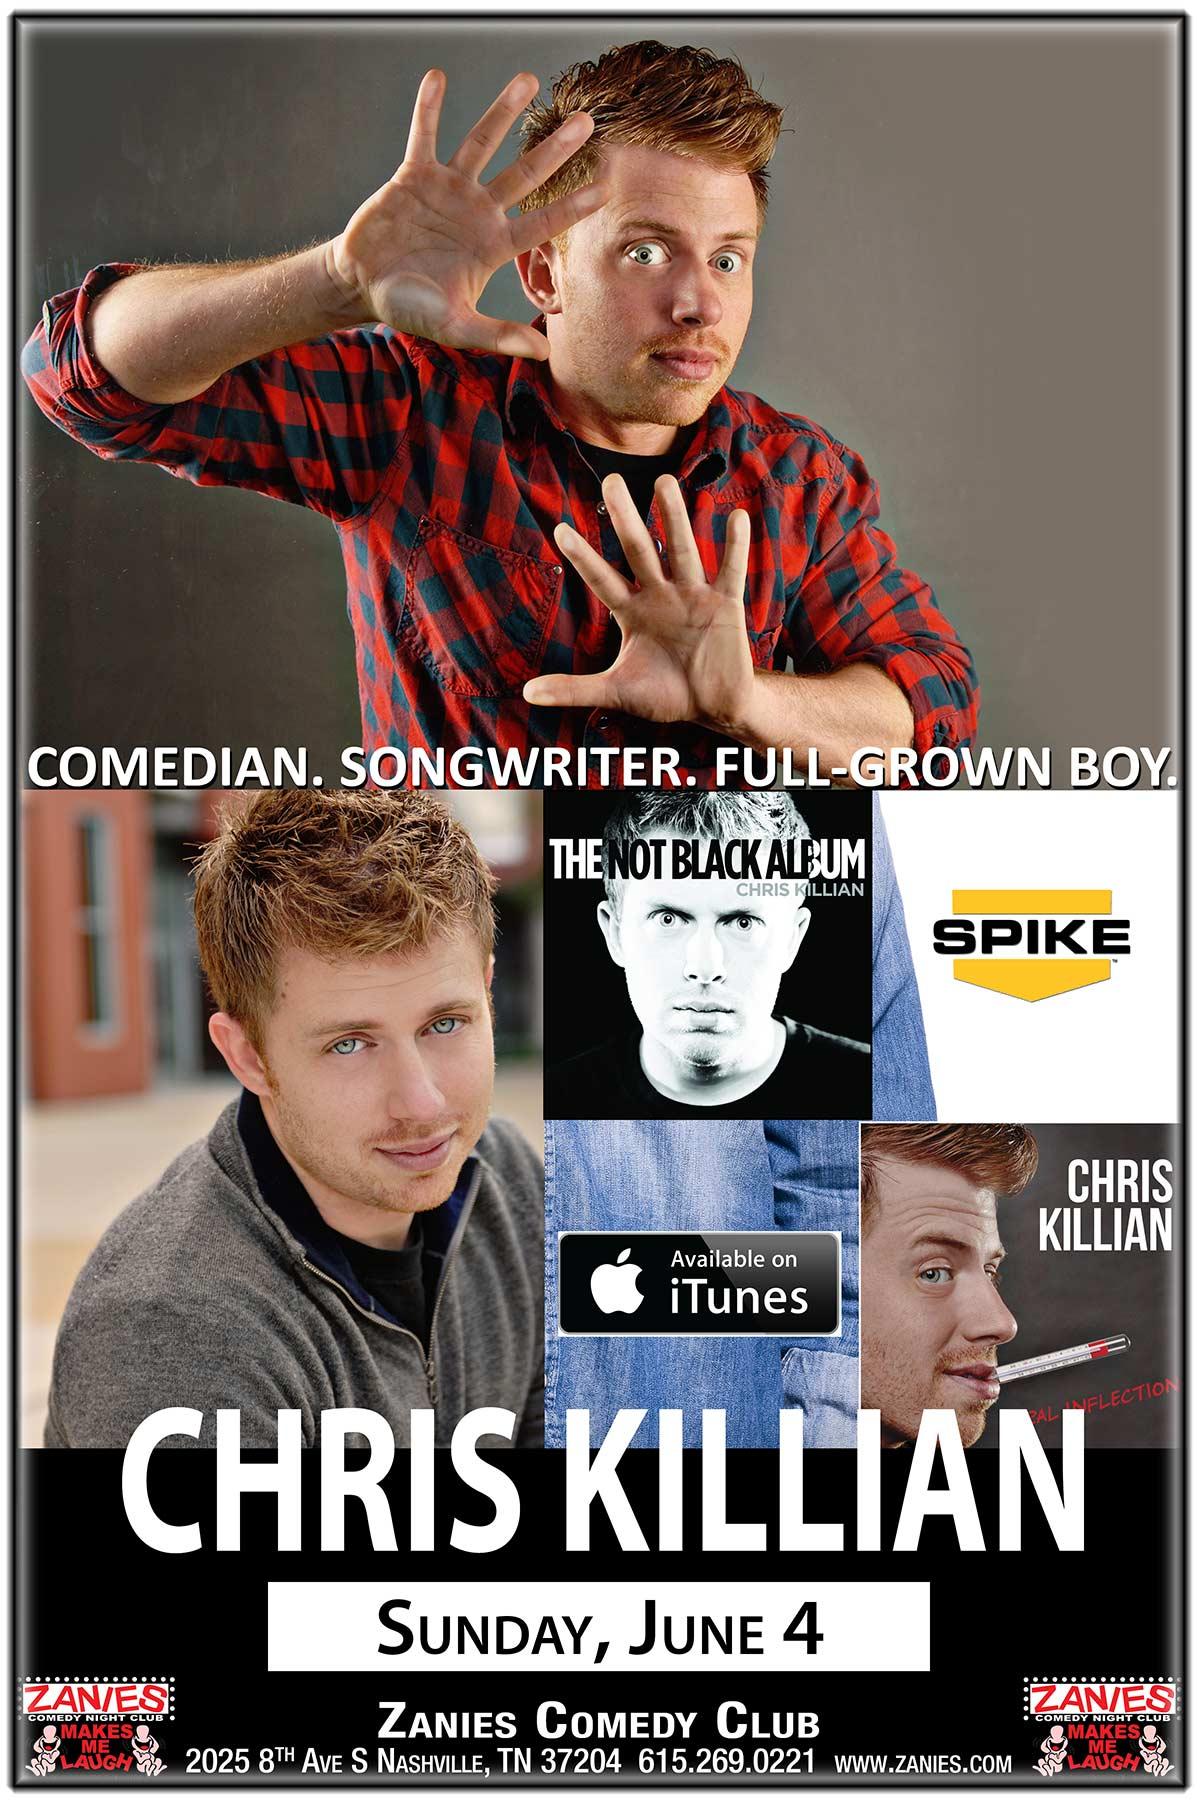 Chris Killian Live at Zanies Comedy Club Nashville June 4, 2017